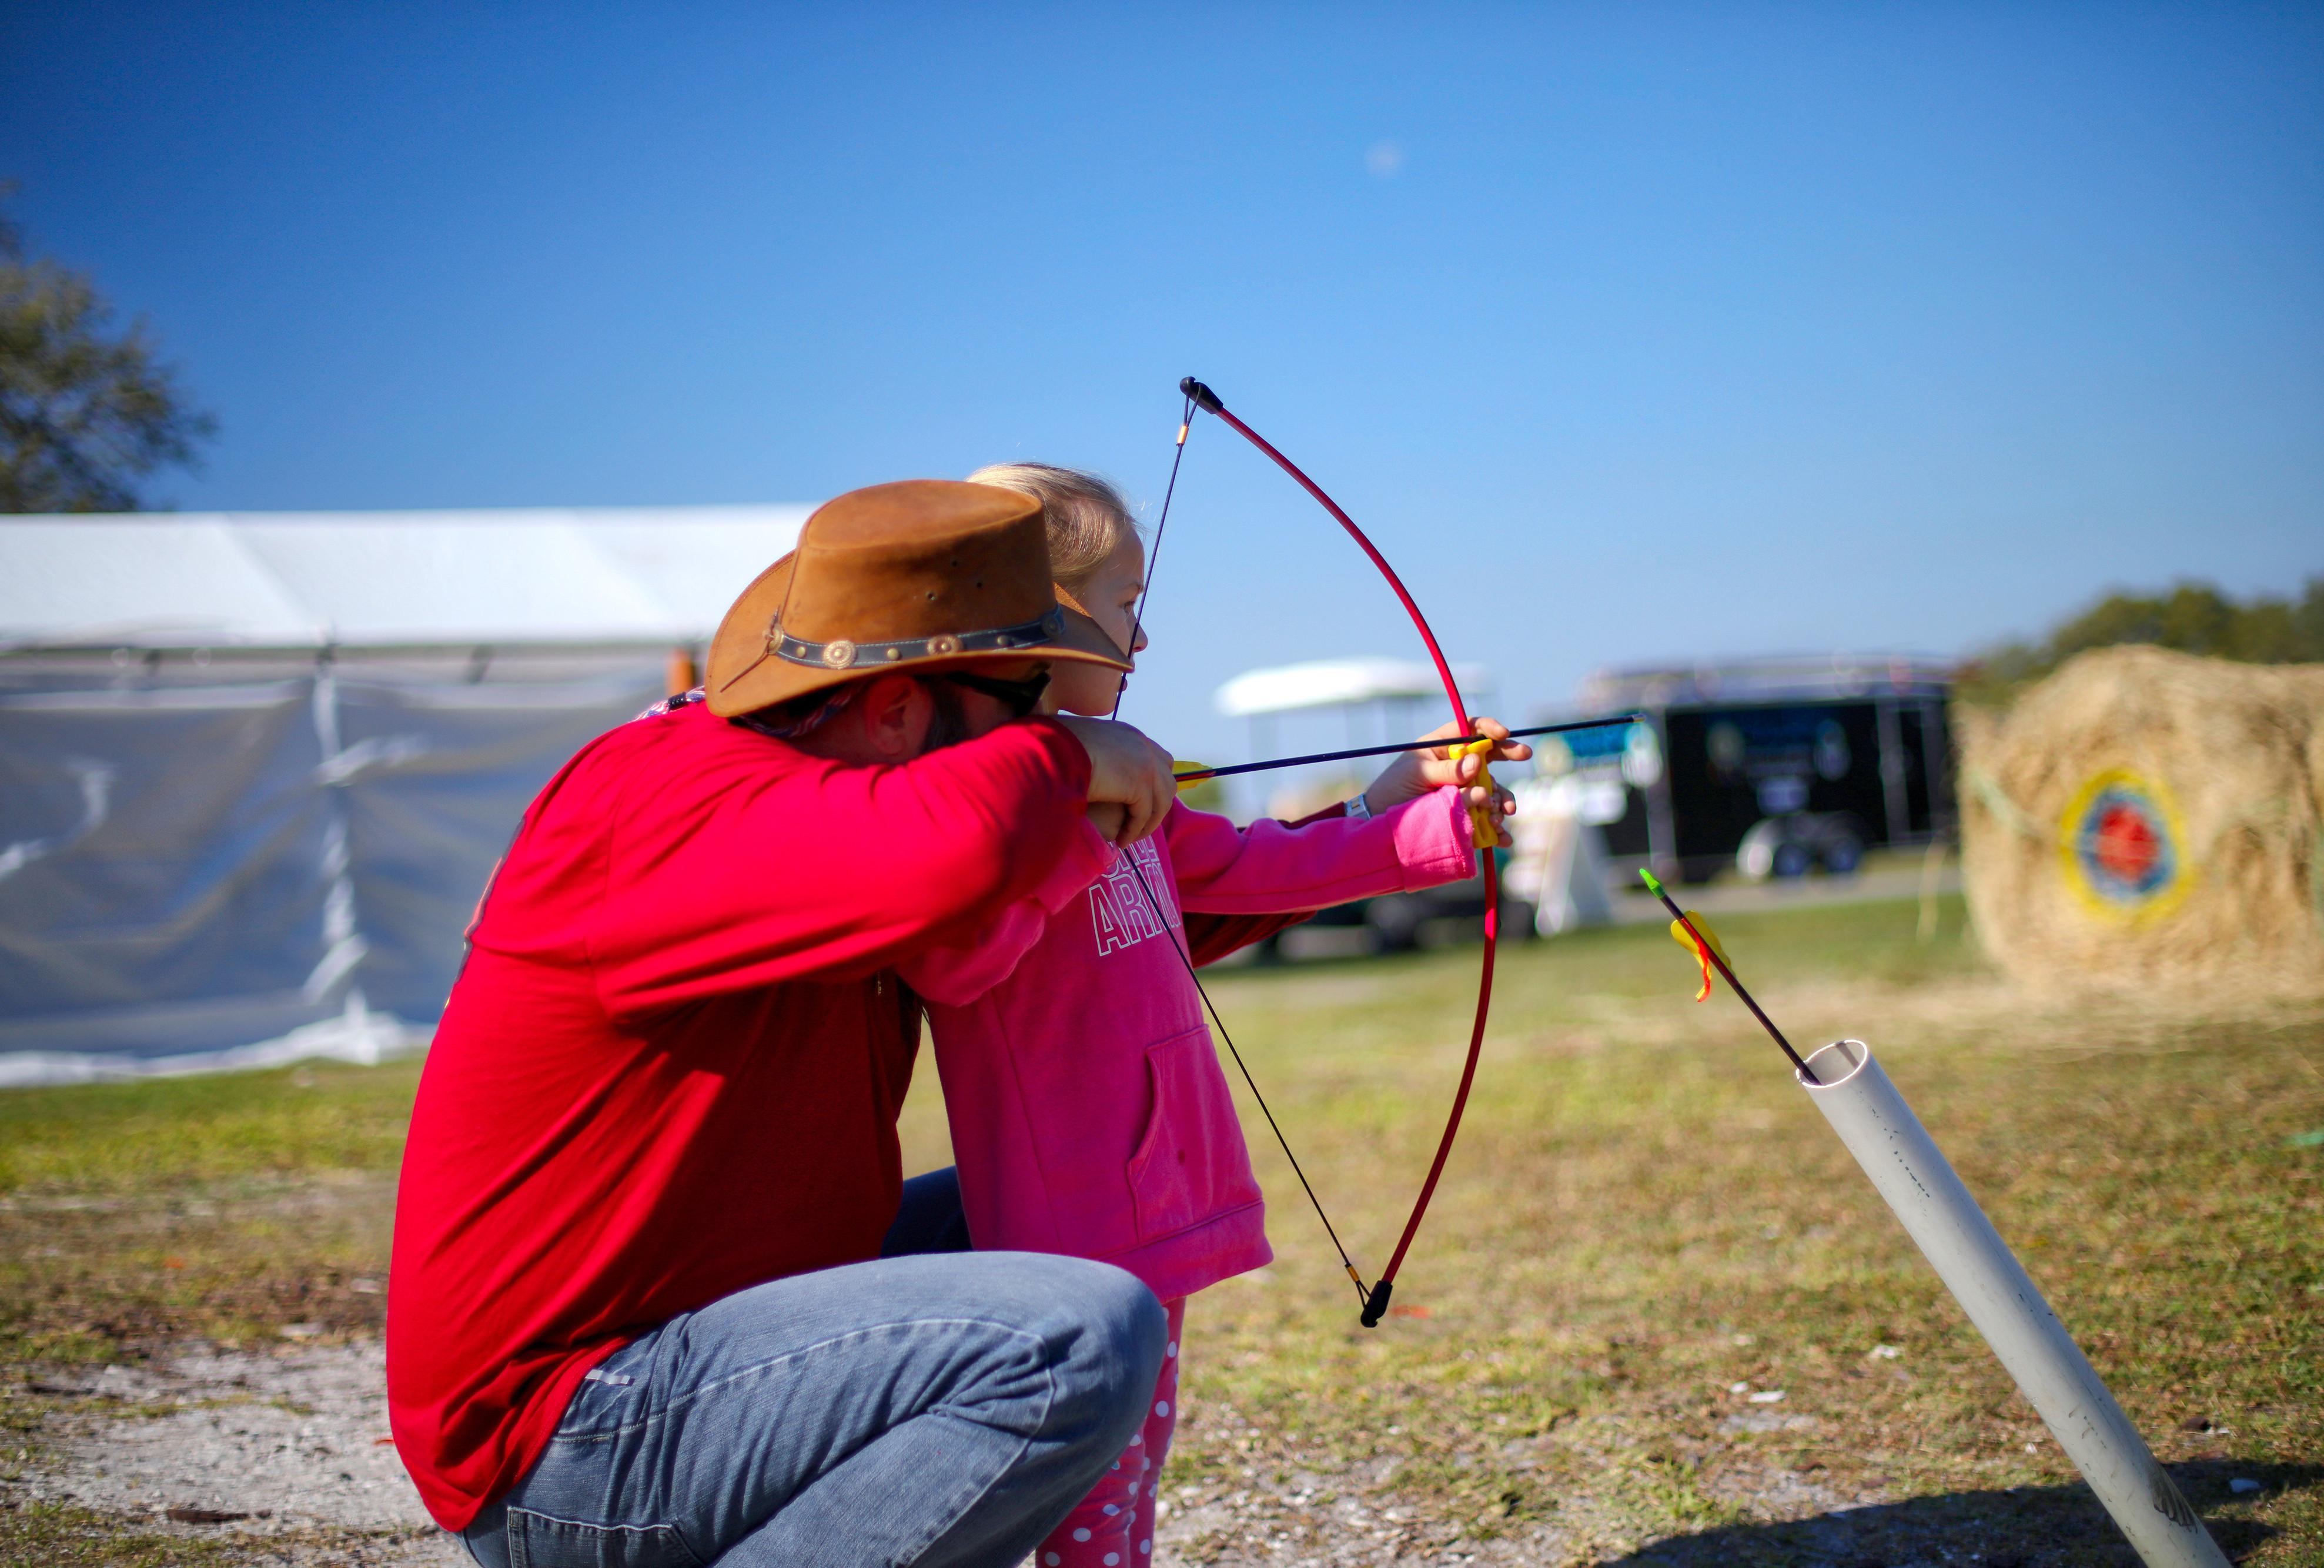 Outback Archery Joplin Mo